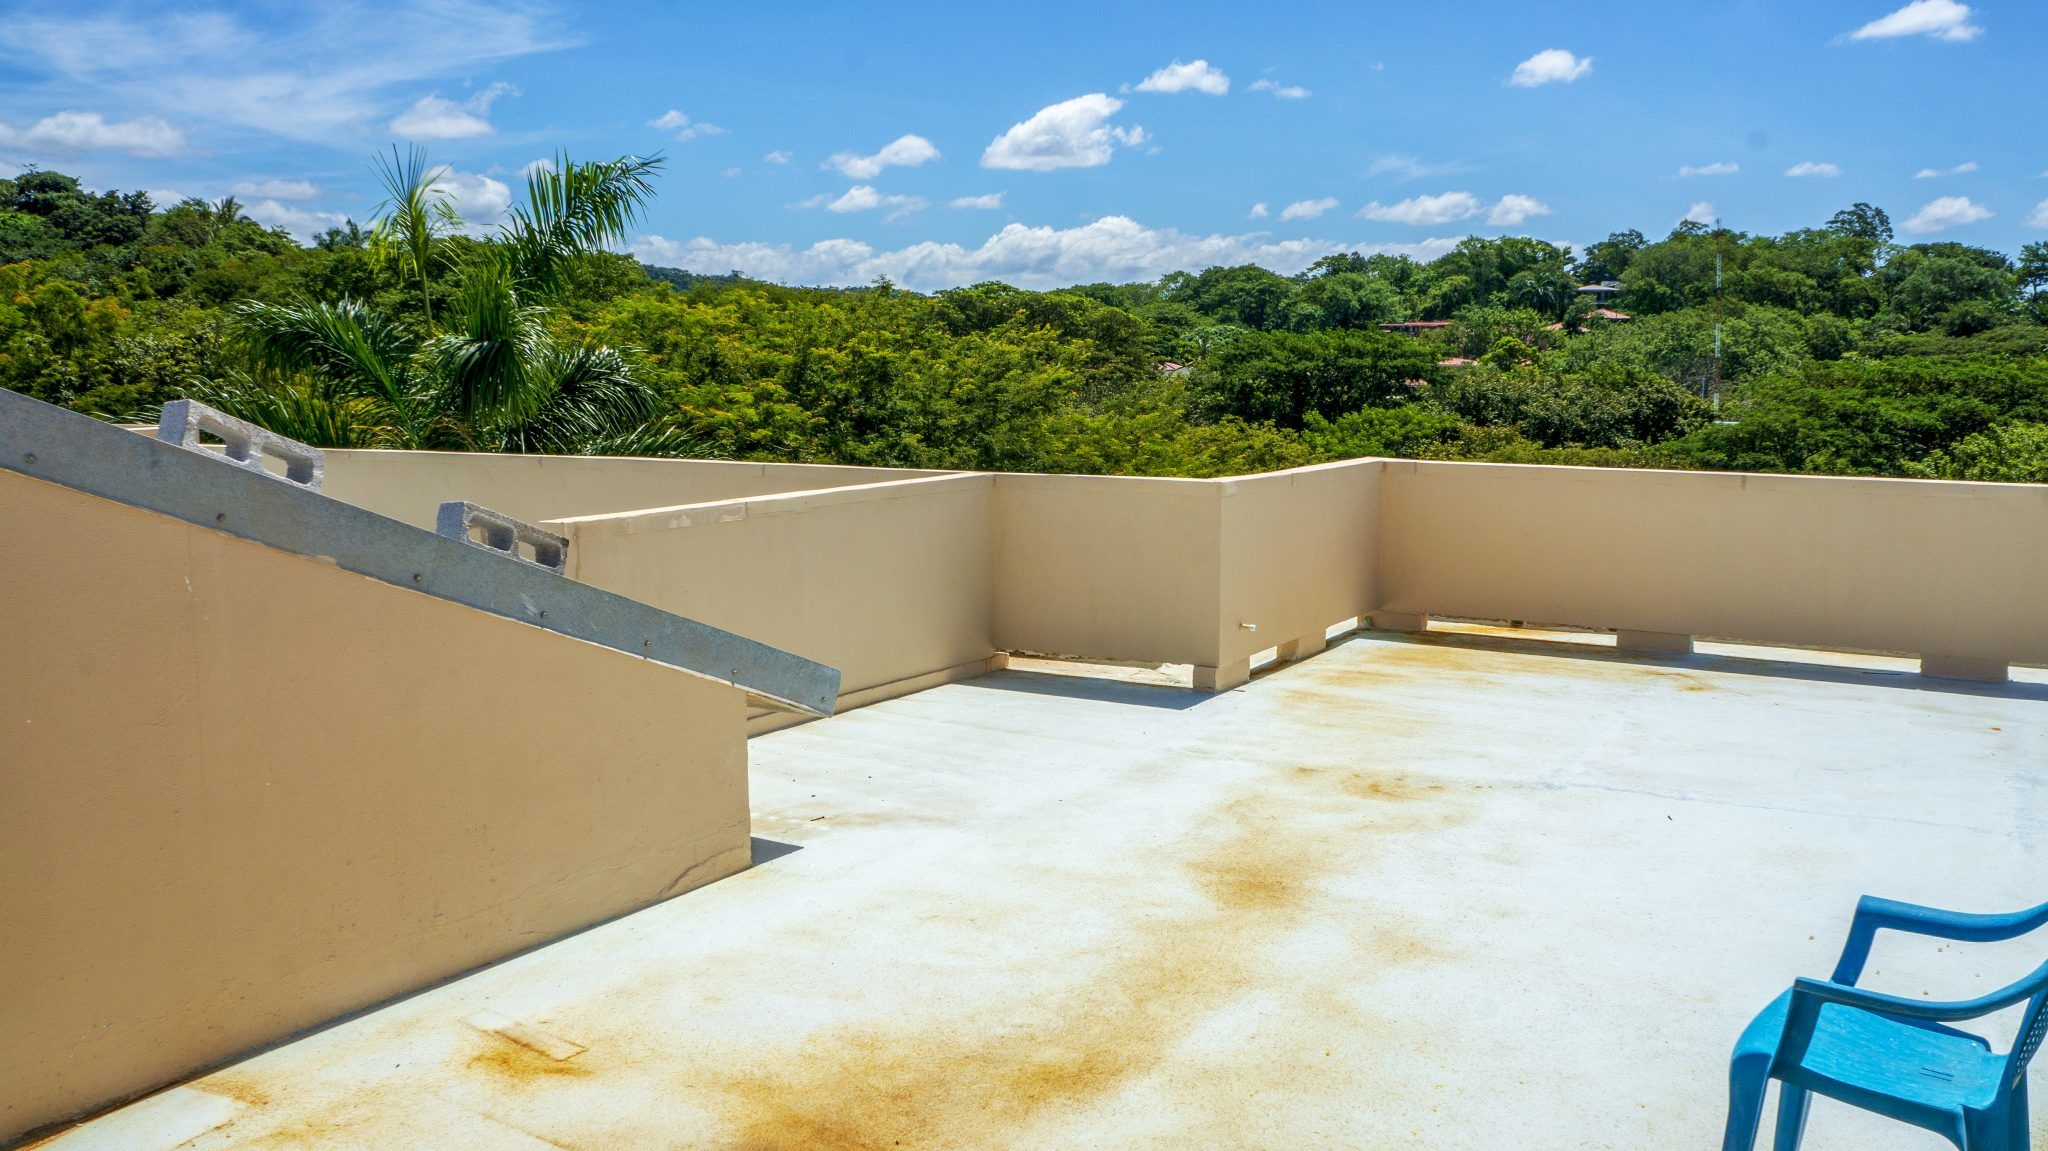 LC17 - Balcony View